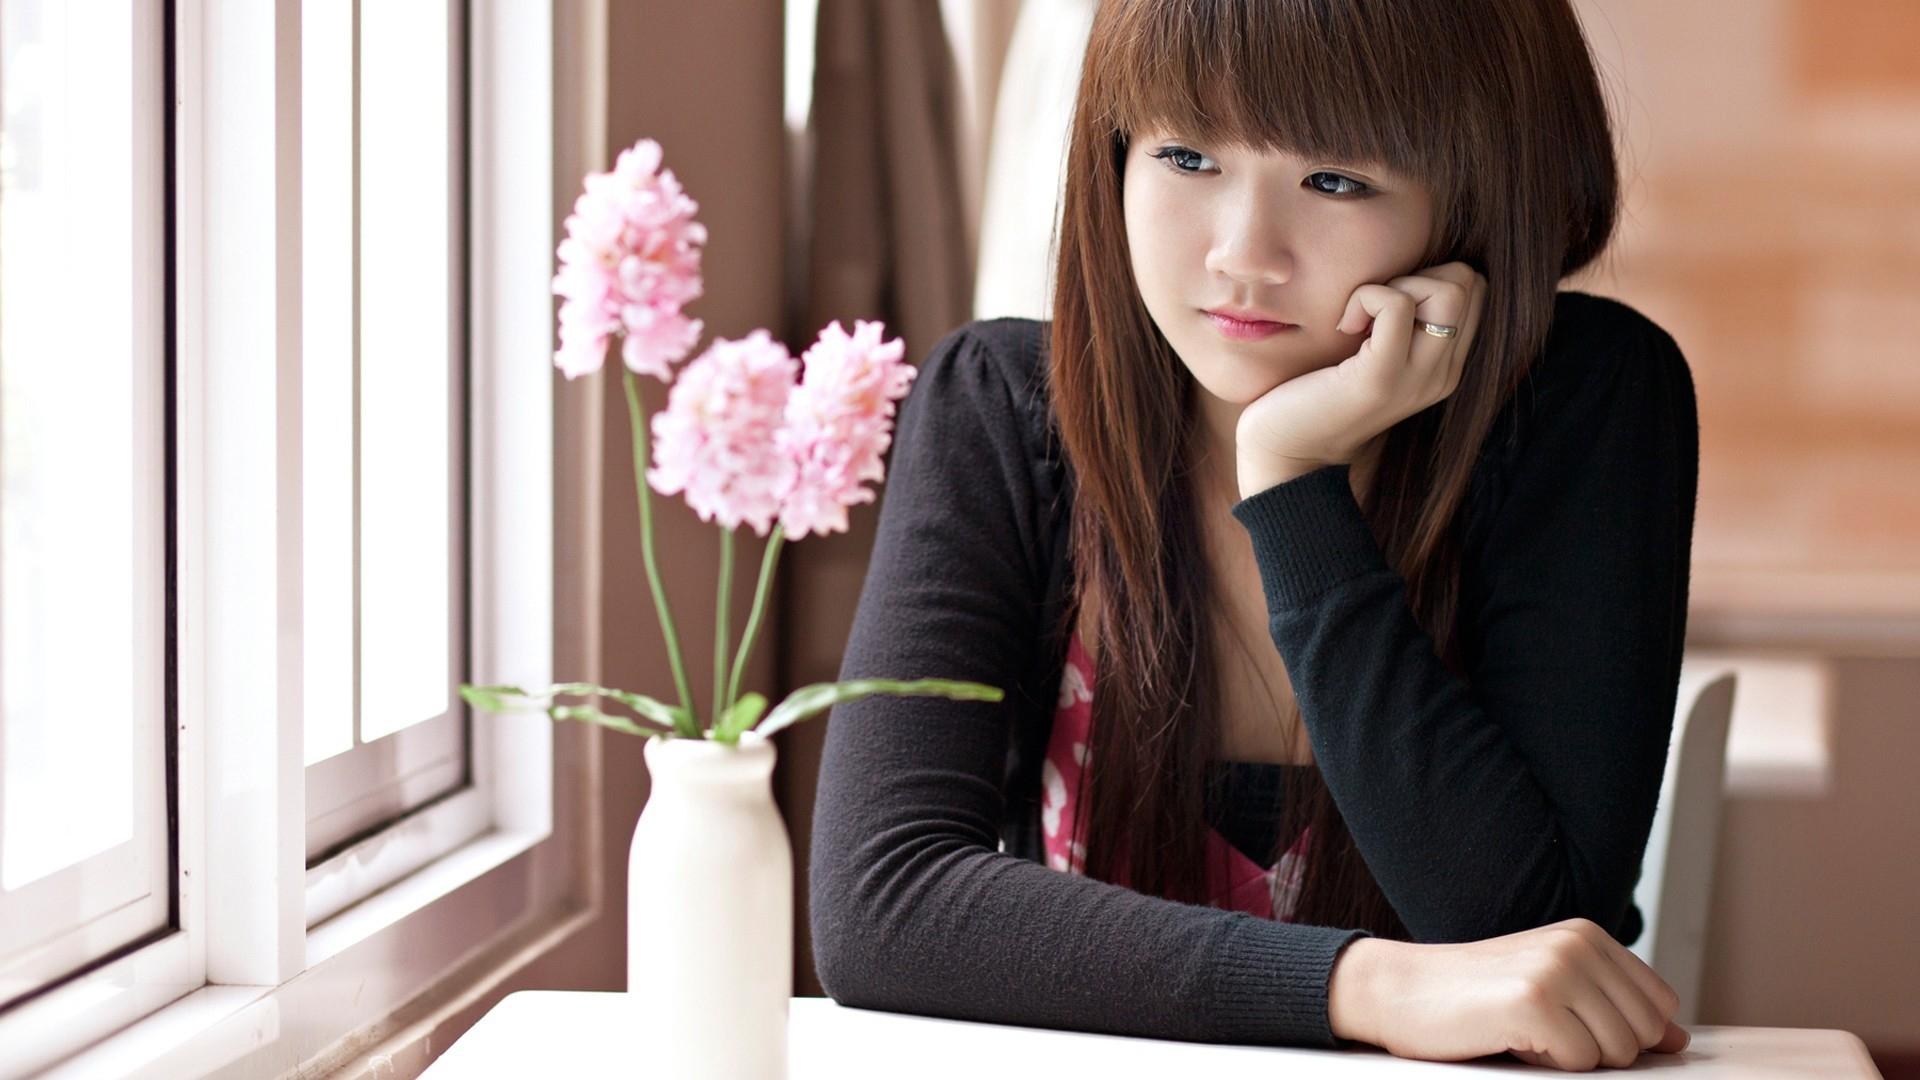 Cute Asian Girl Wallpaper #7021498